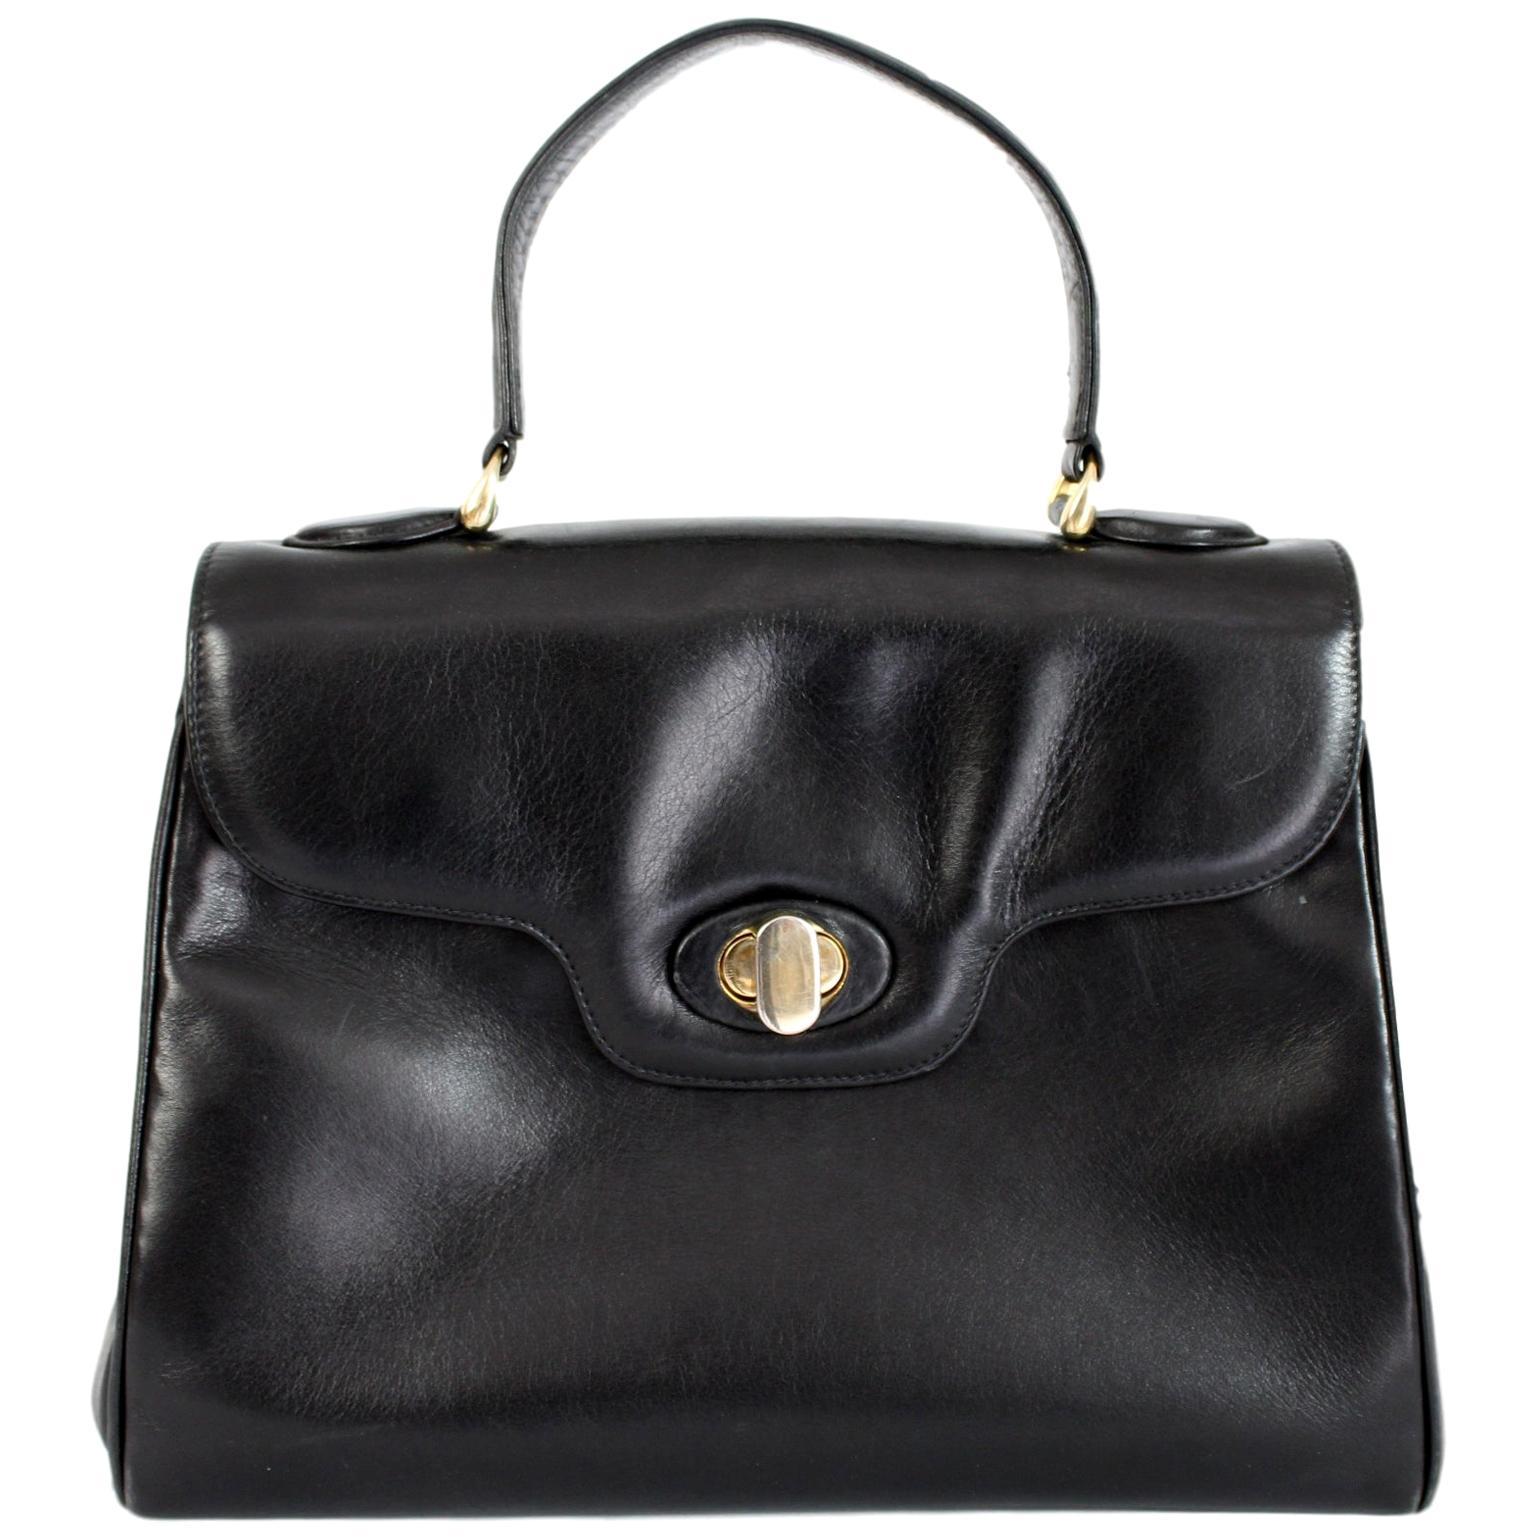 Fratelli Rossetti Black Leather Rigid Doctor Handbag 1980s